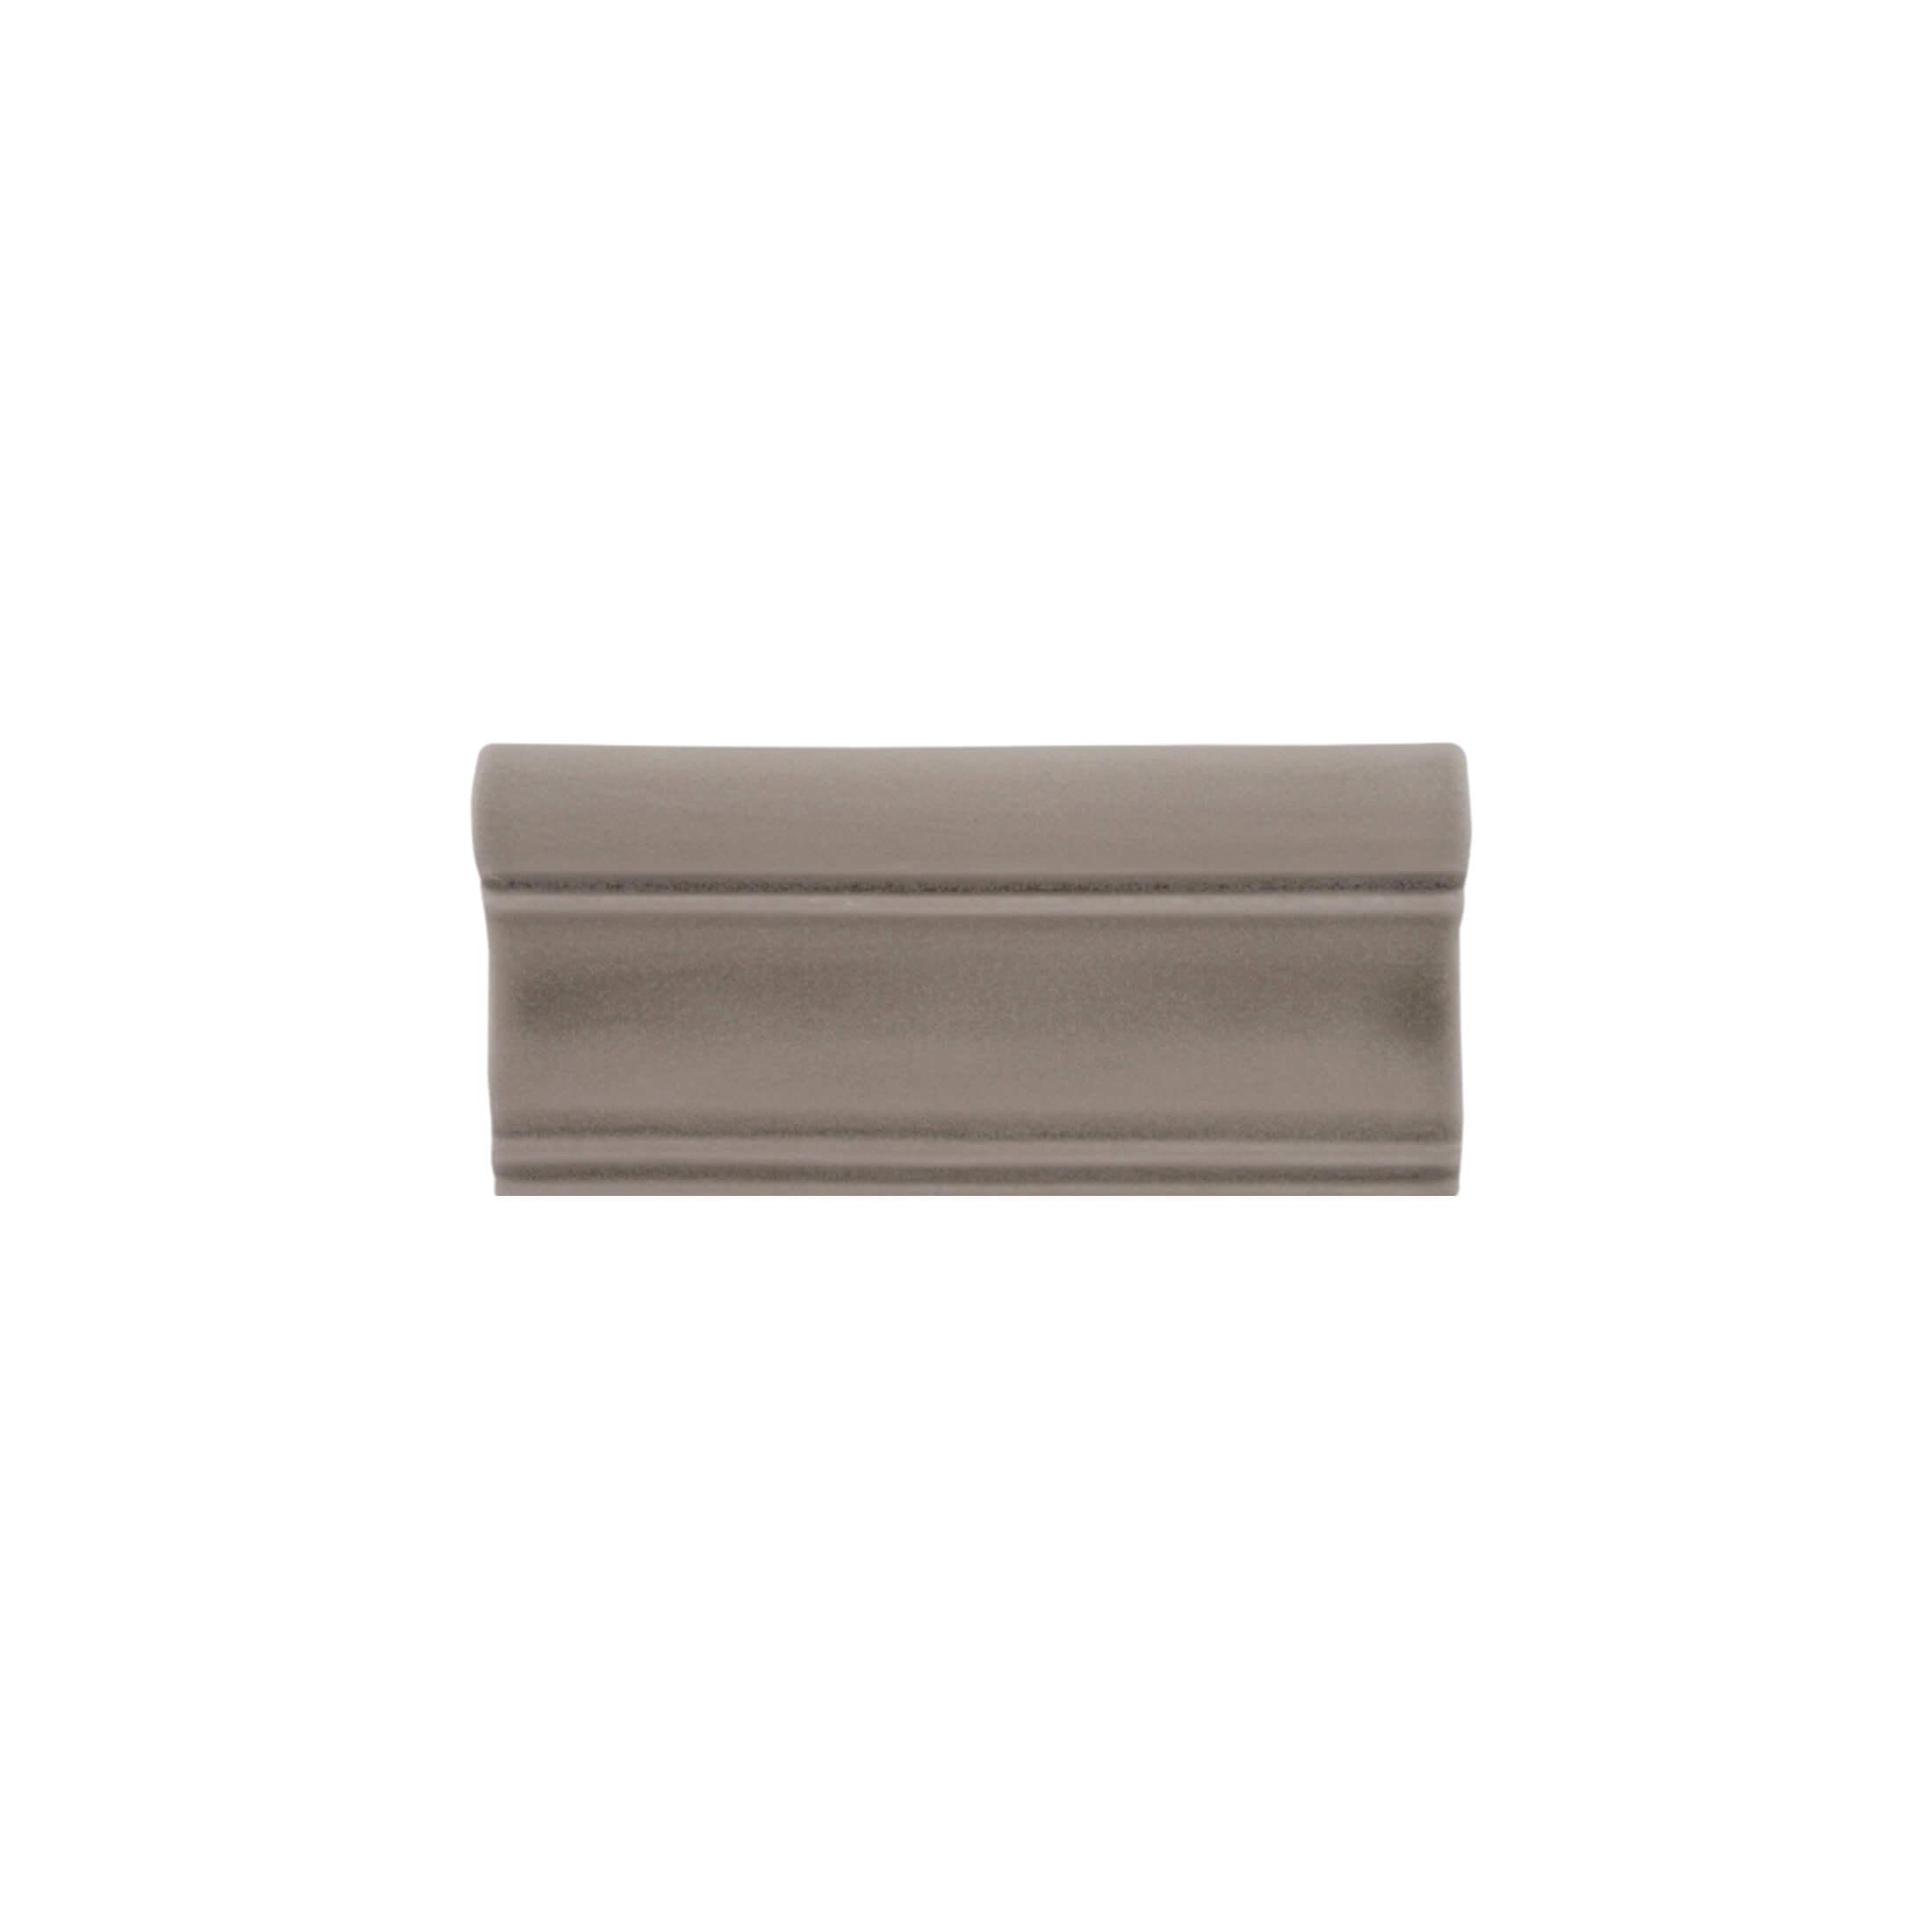 ADNT5017 - CORNISA  - 7.5 cm X 15 cm